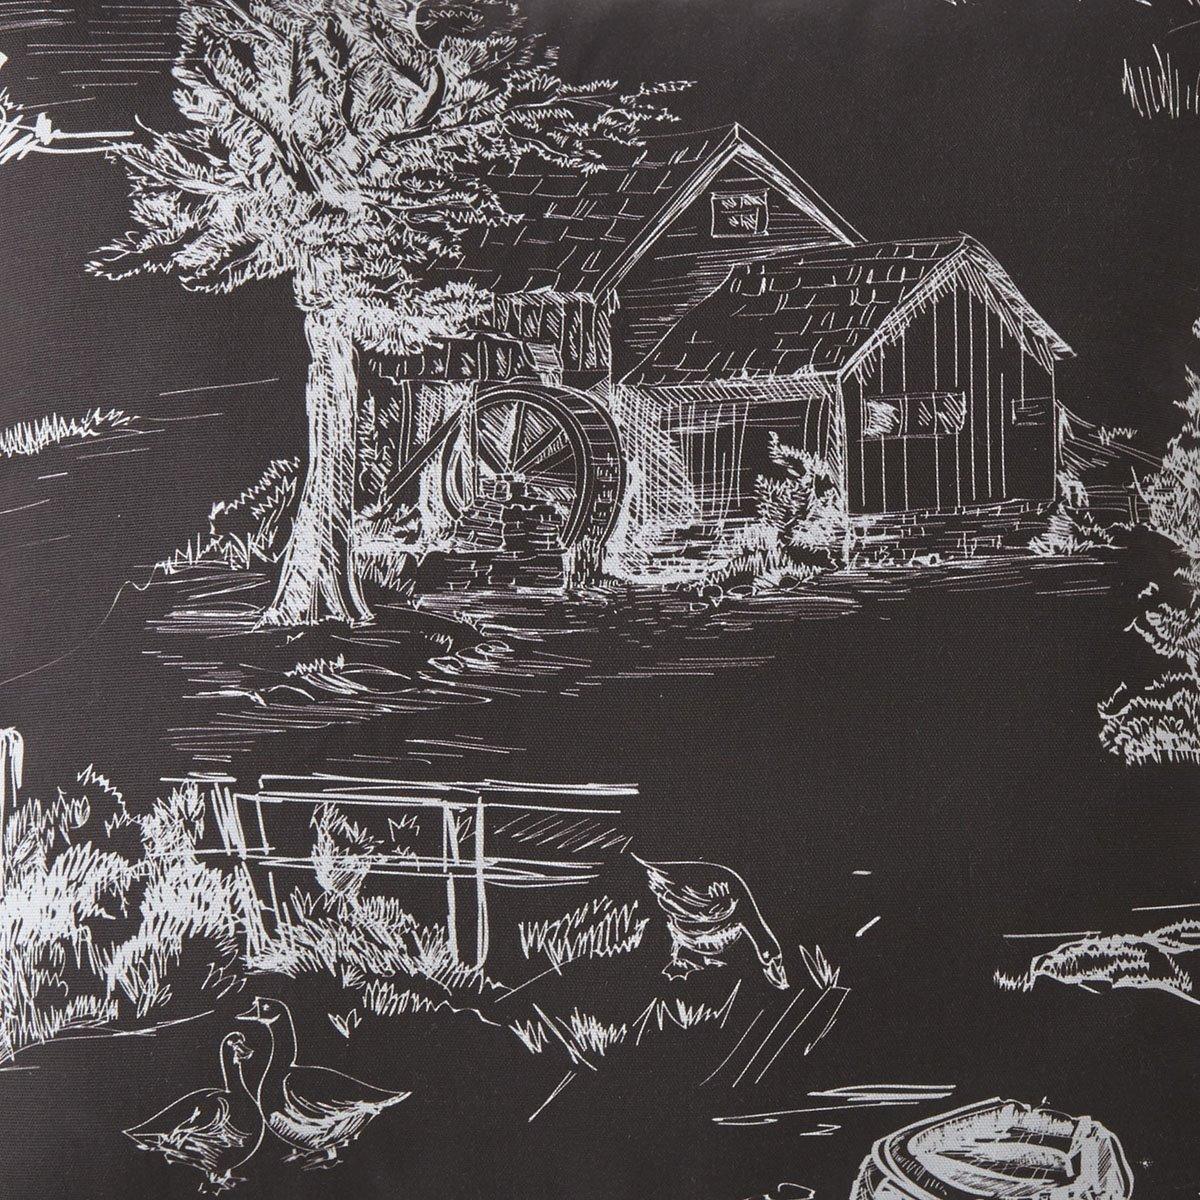 Toile Back In Black Reverse Fabric Per Yard -Black Background, White Print